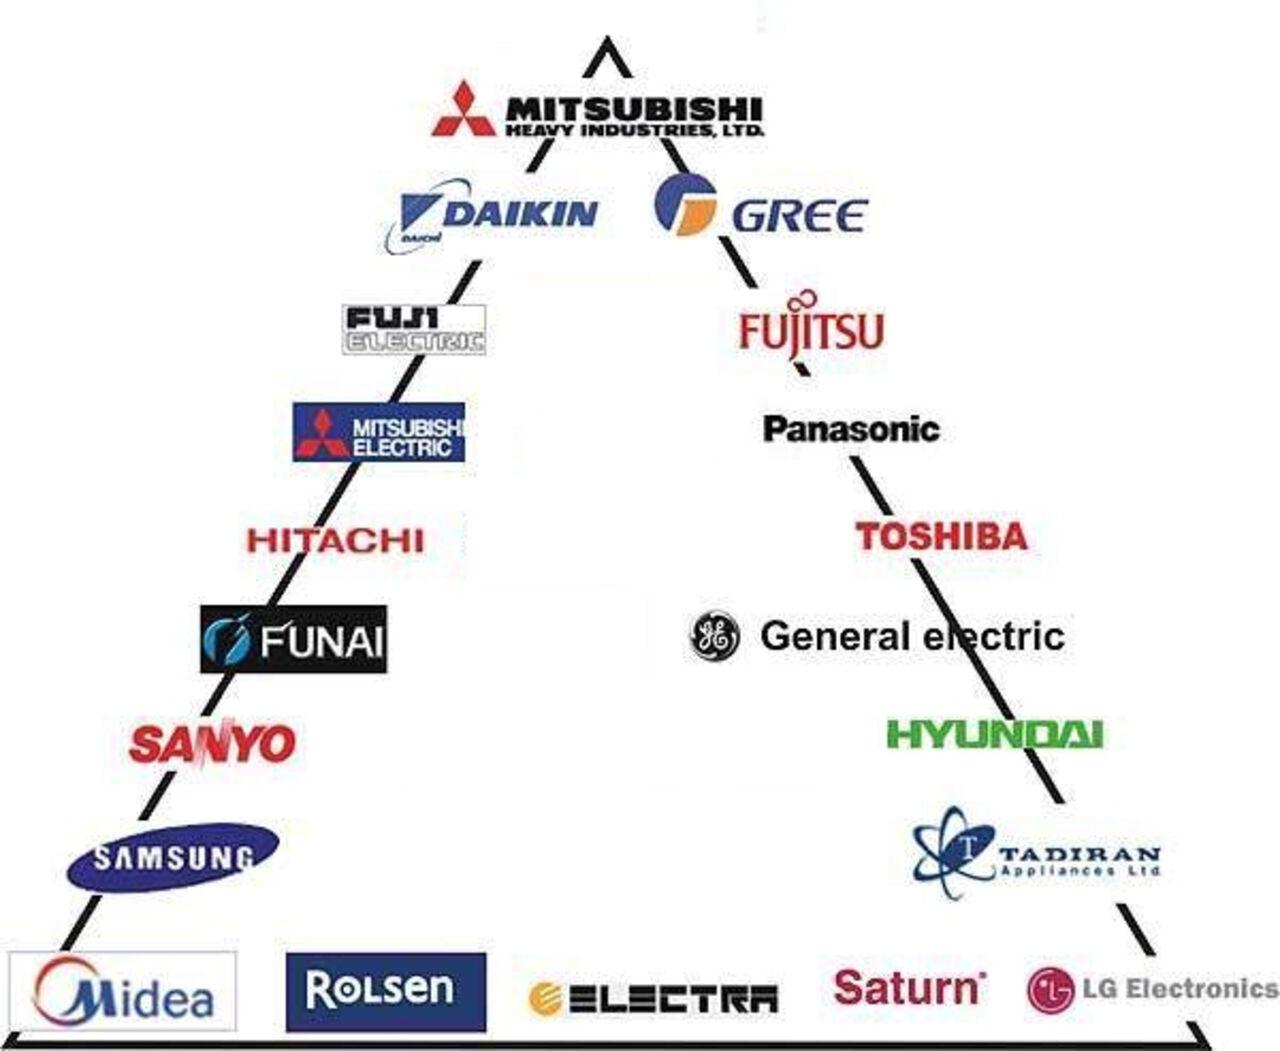 инструкция к кондиционеру mitsubishi heavy industries ltd